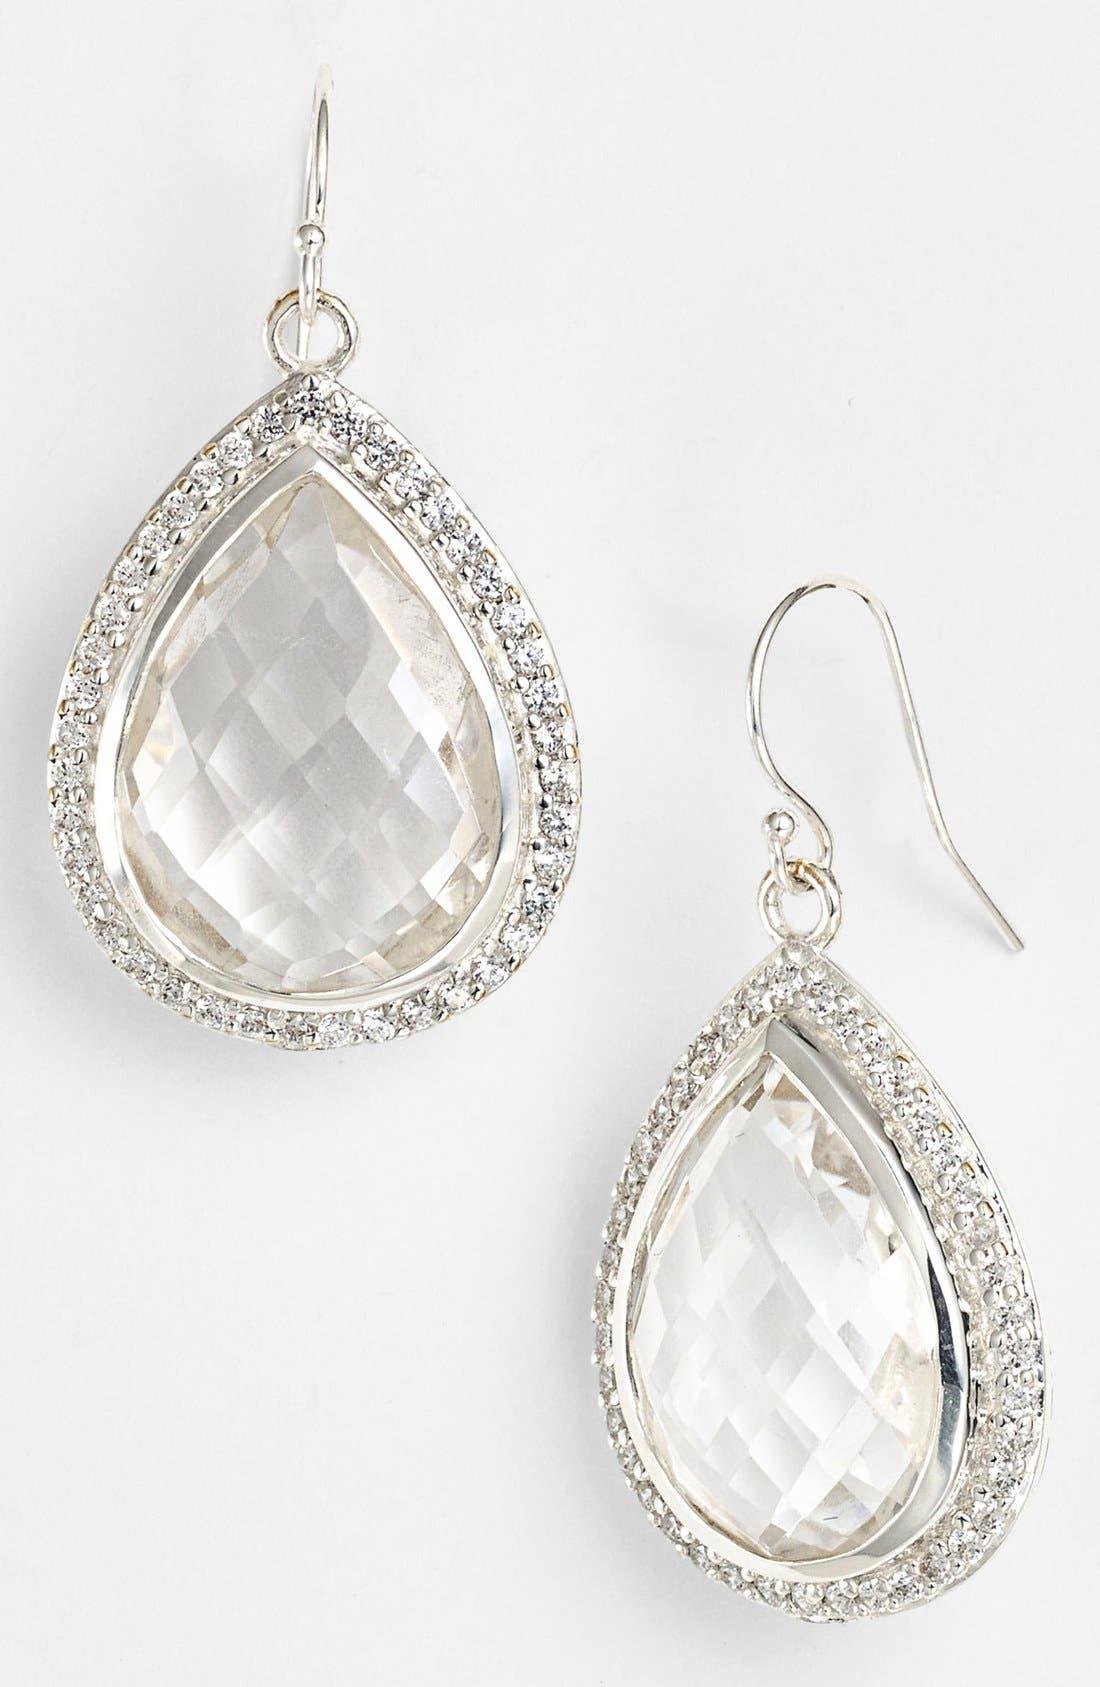 Main Image - NuNu Designs Large Teardrop Earrings